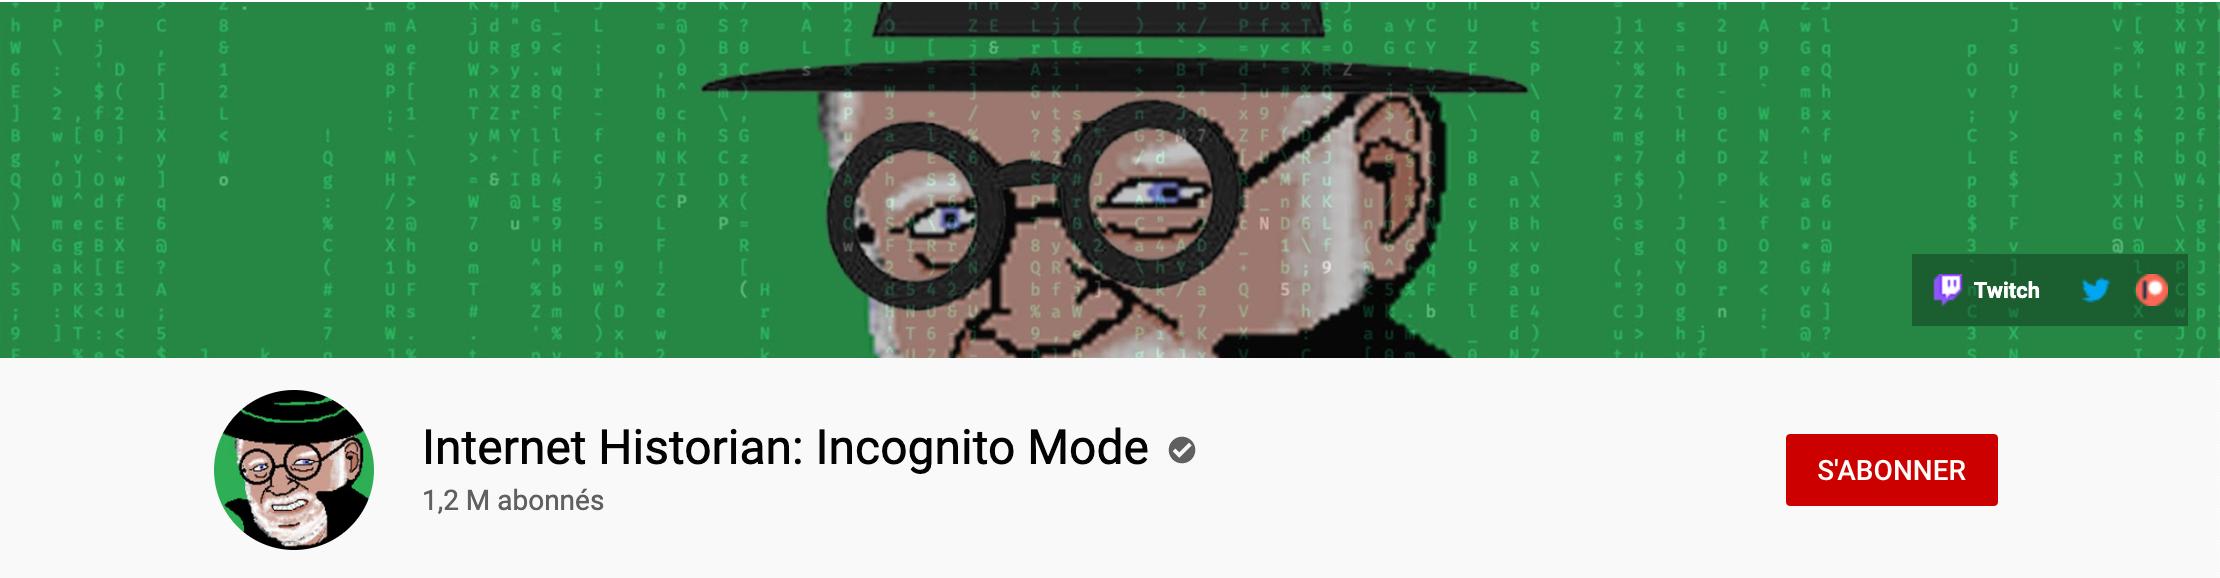 Youtube Cover of Internet Historian: Incognito Mode